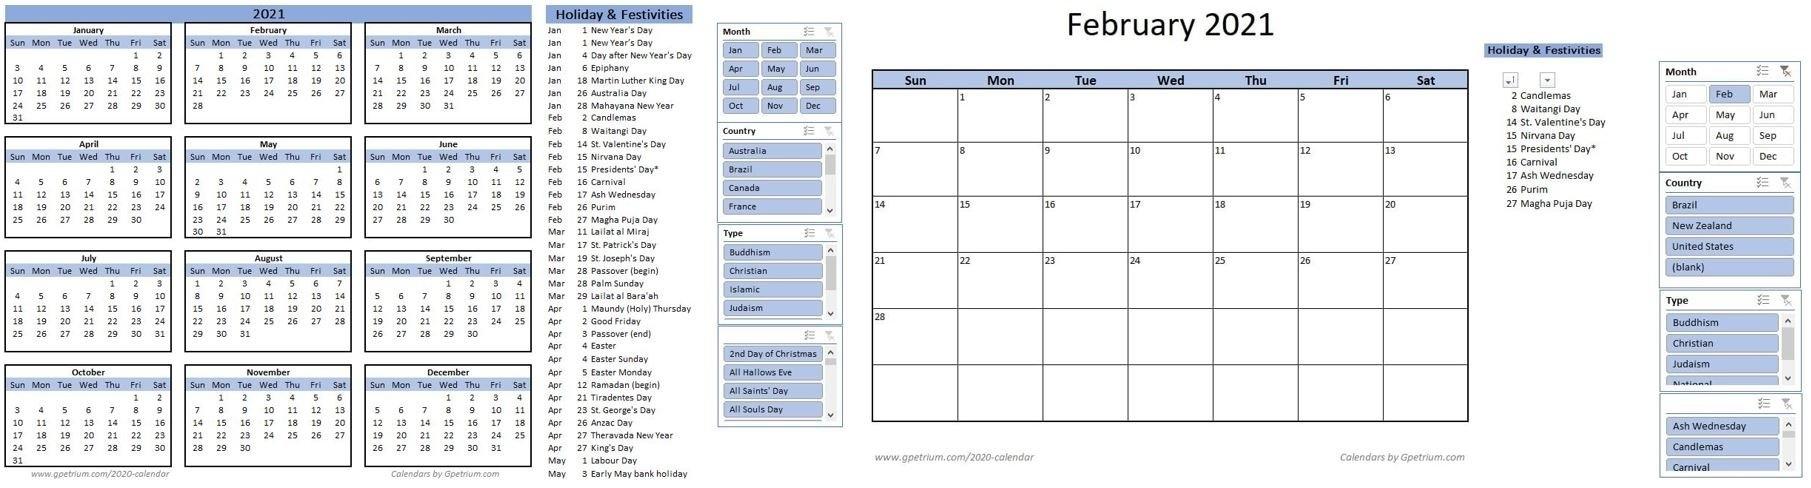 Free 2021 Calendar Template In Excel – Gpetrium 2021 Lined Calendar Printable Excel